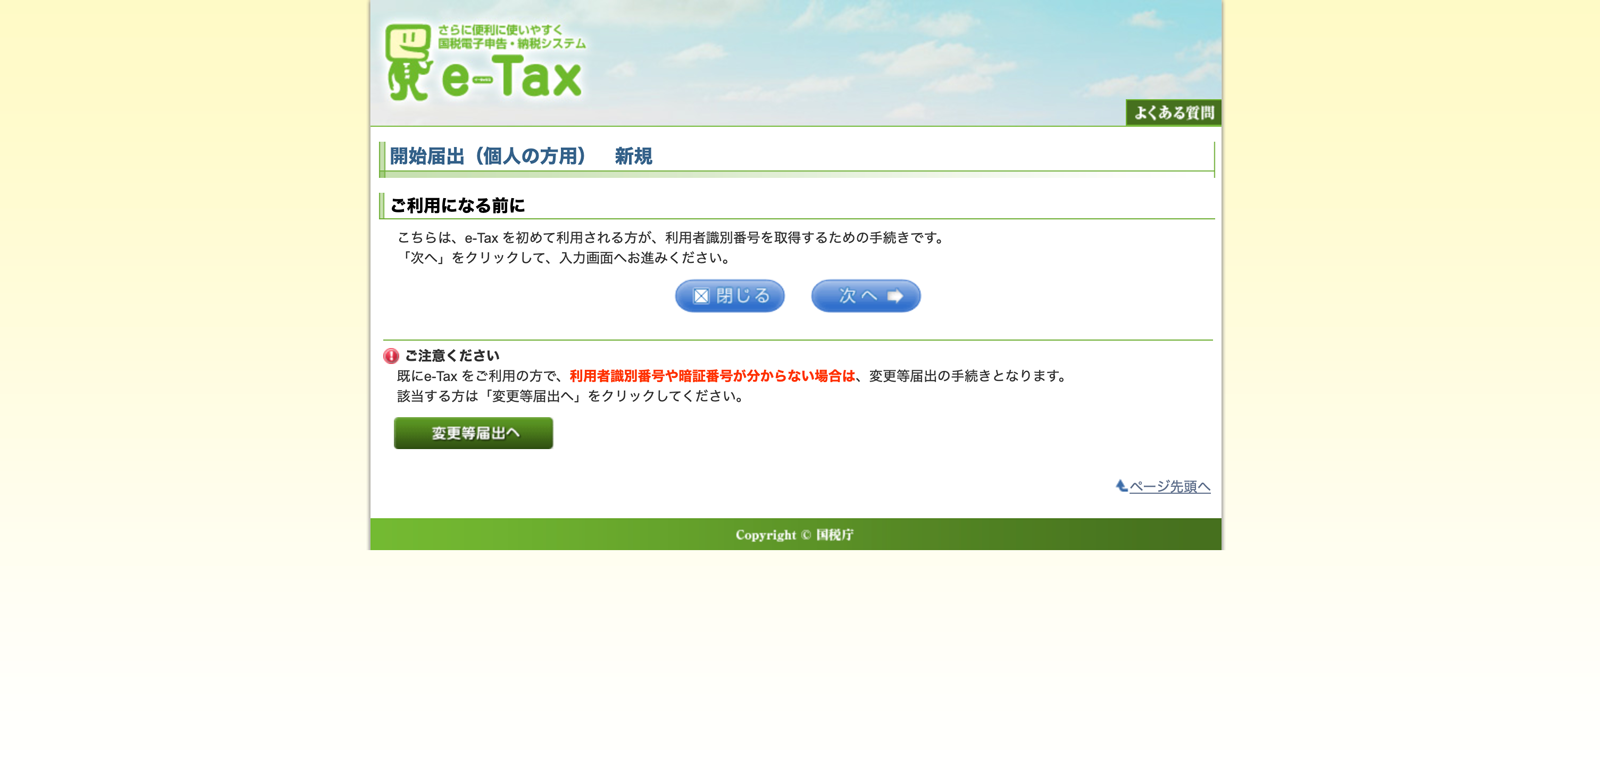 e-Taxの利用登録・利用者識別番号と暗証番号の取得